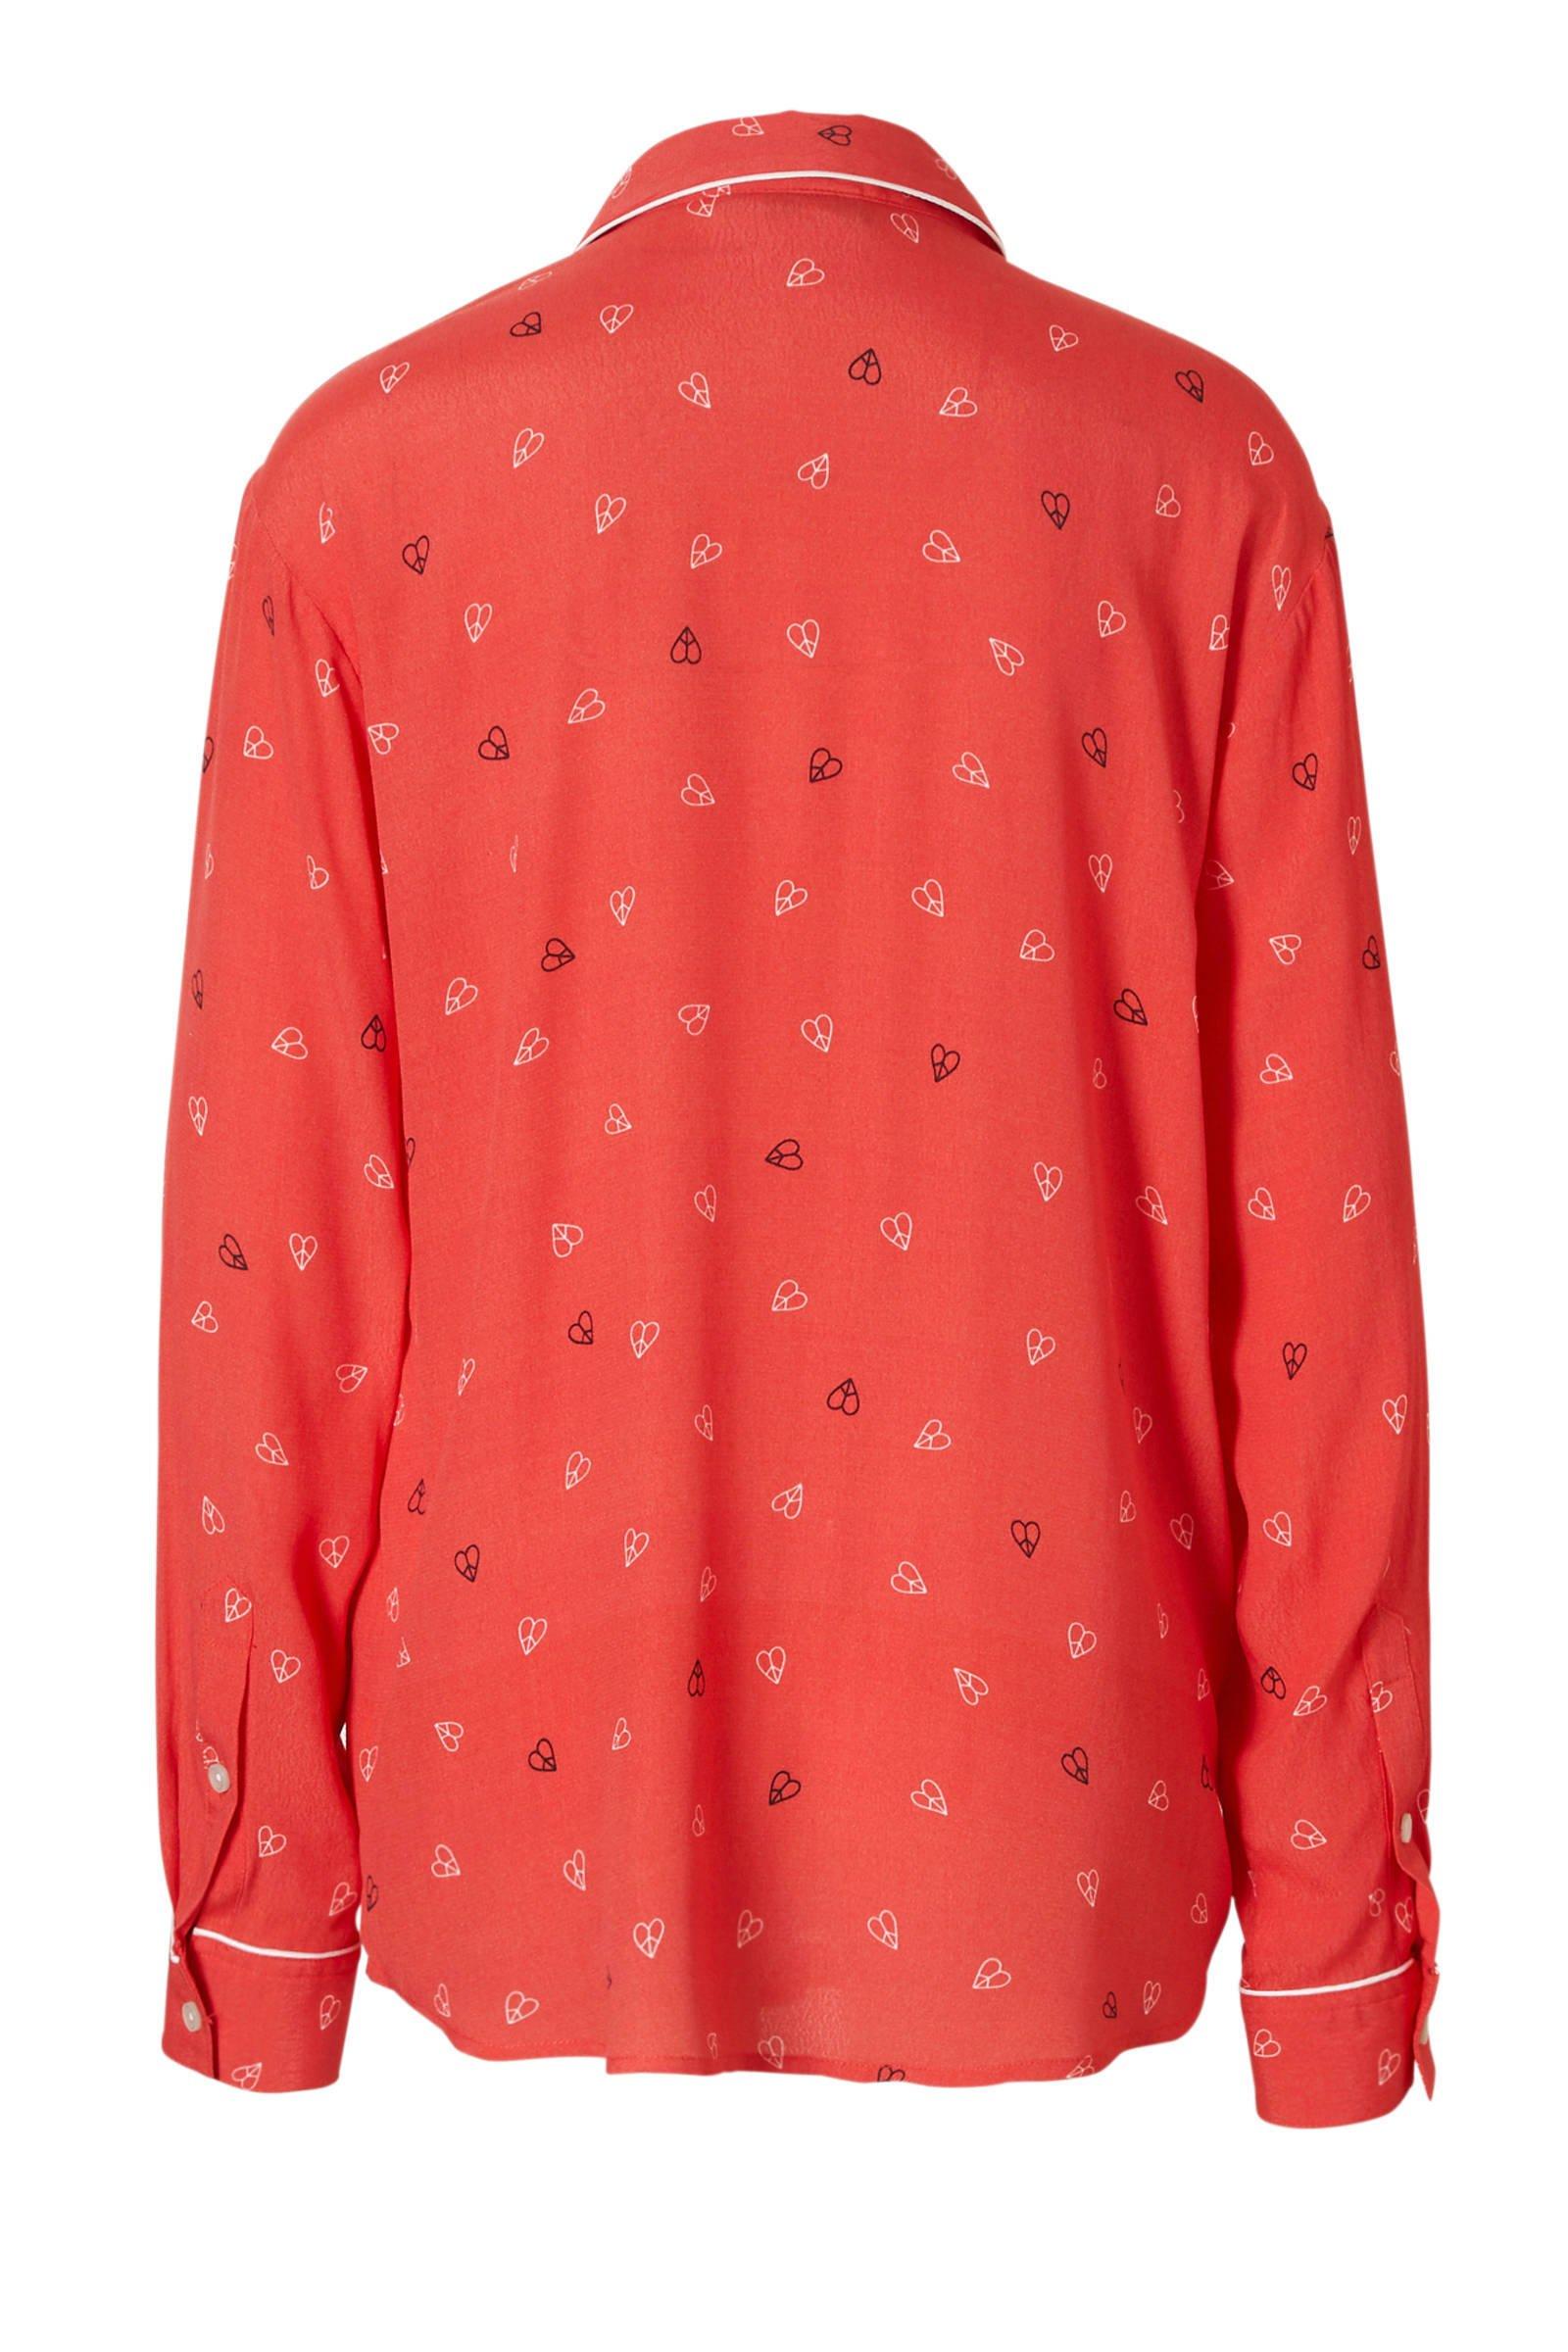 Catwalk Junkie Catwalk blouse Junkie blouse Catwalk Junkie blouse rBwS4tqxrZ